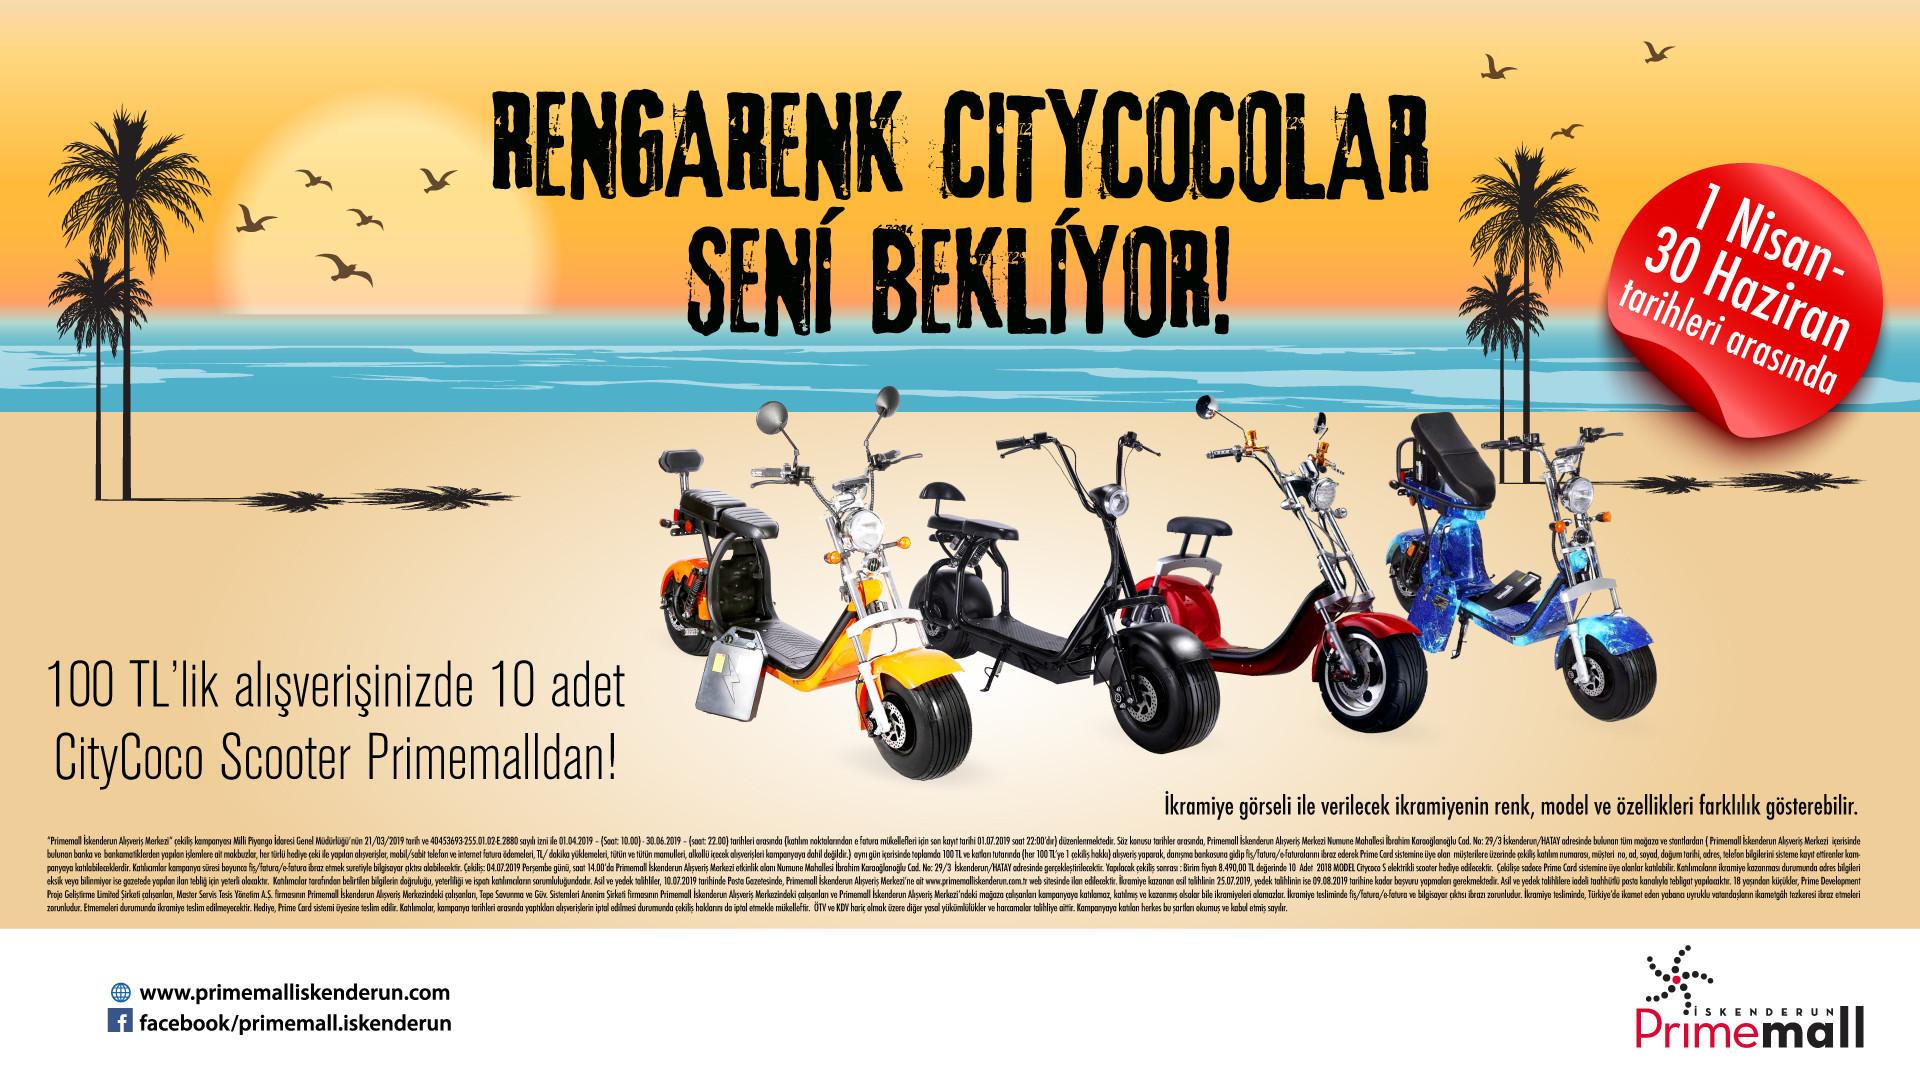 Rengarenk Citycocolar Seni Bekliyor!